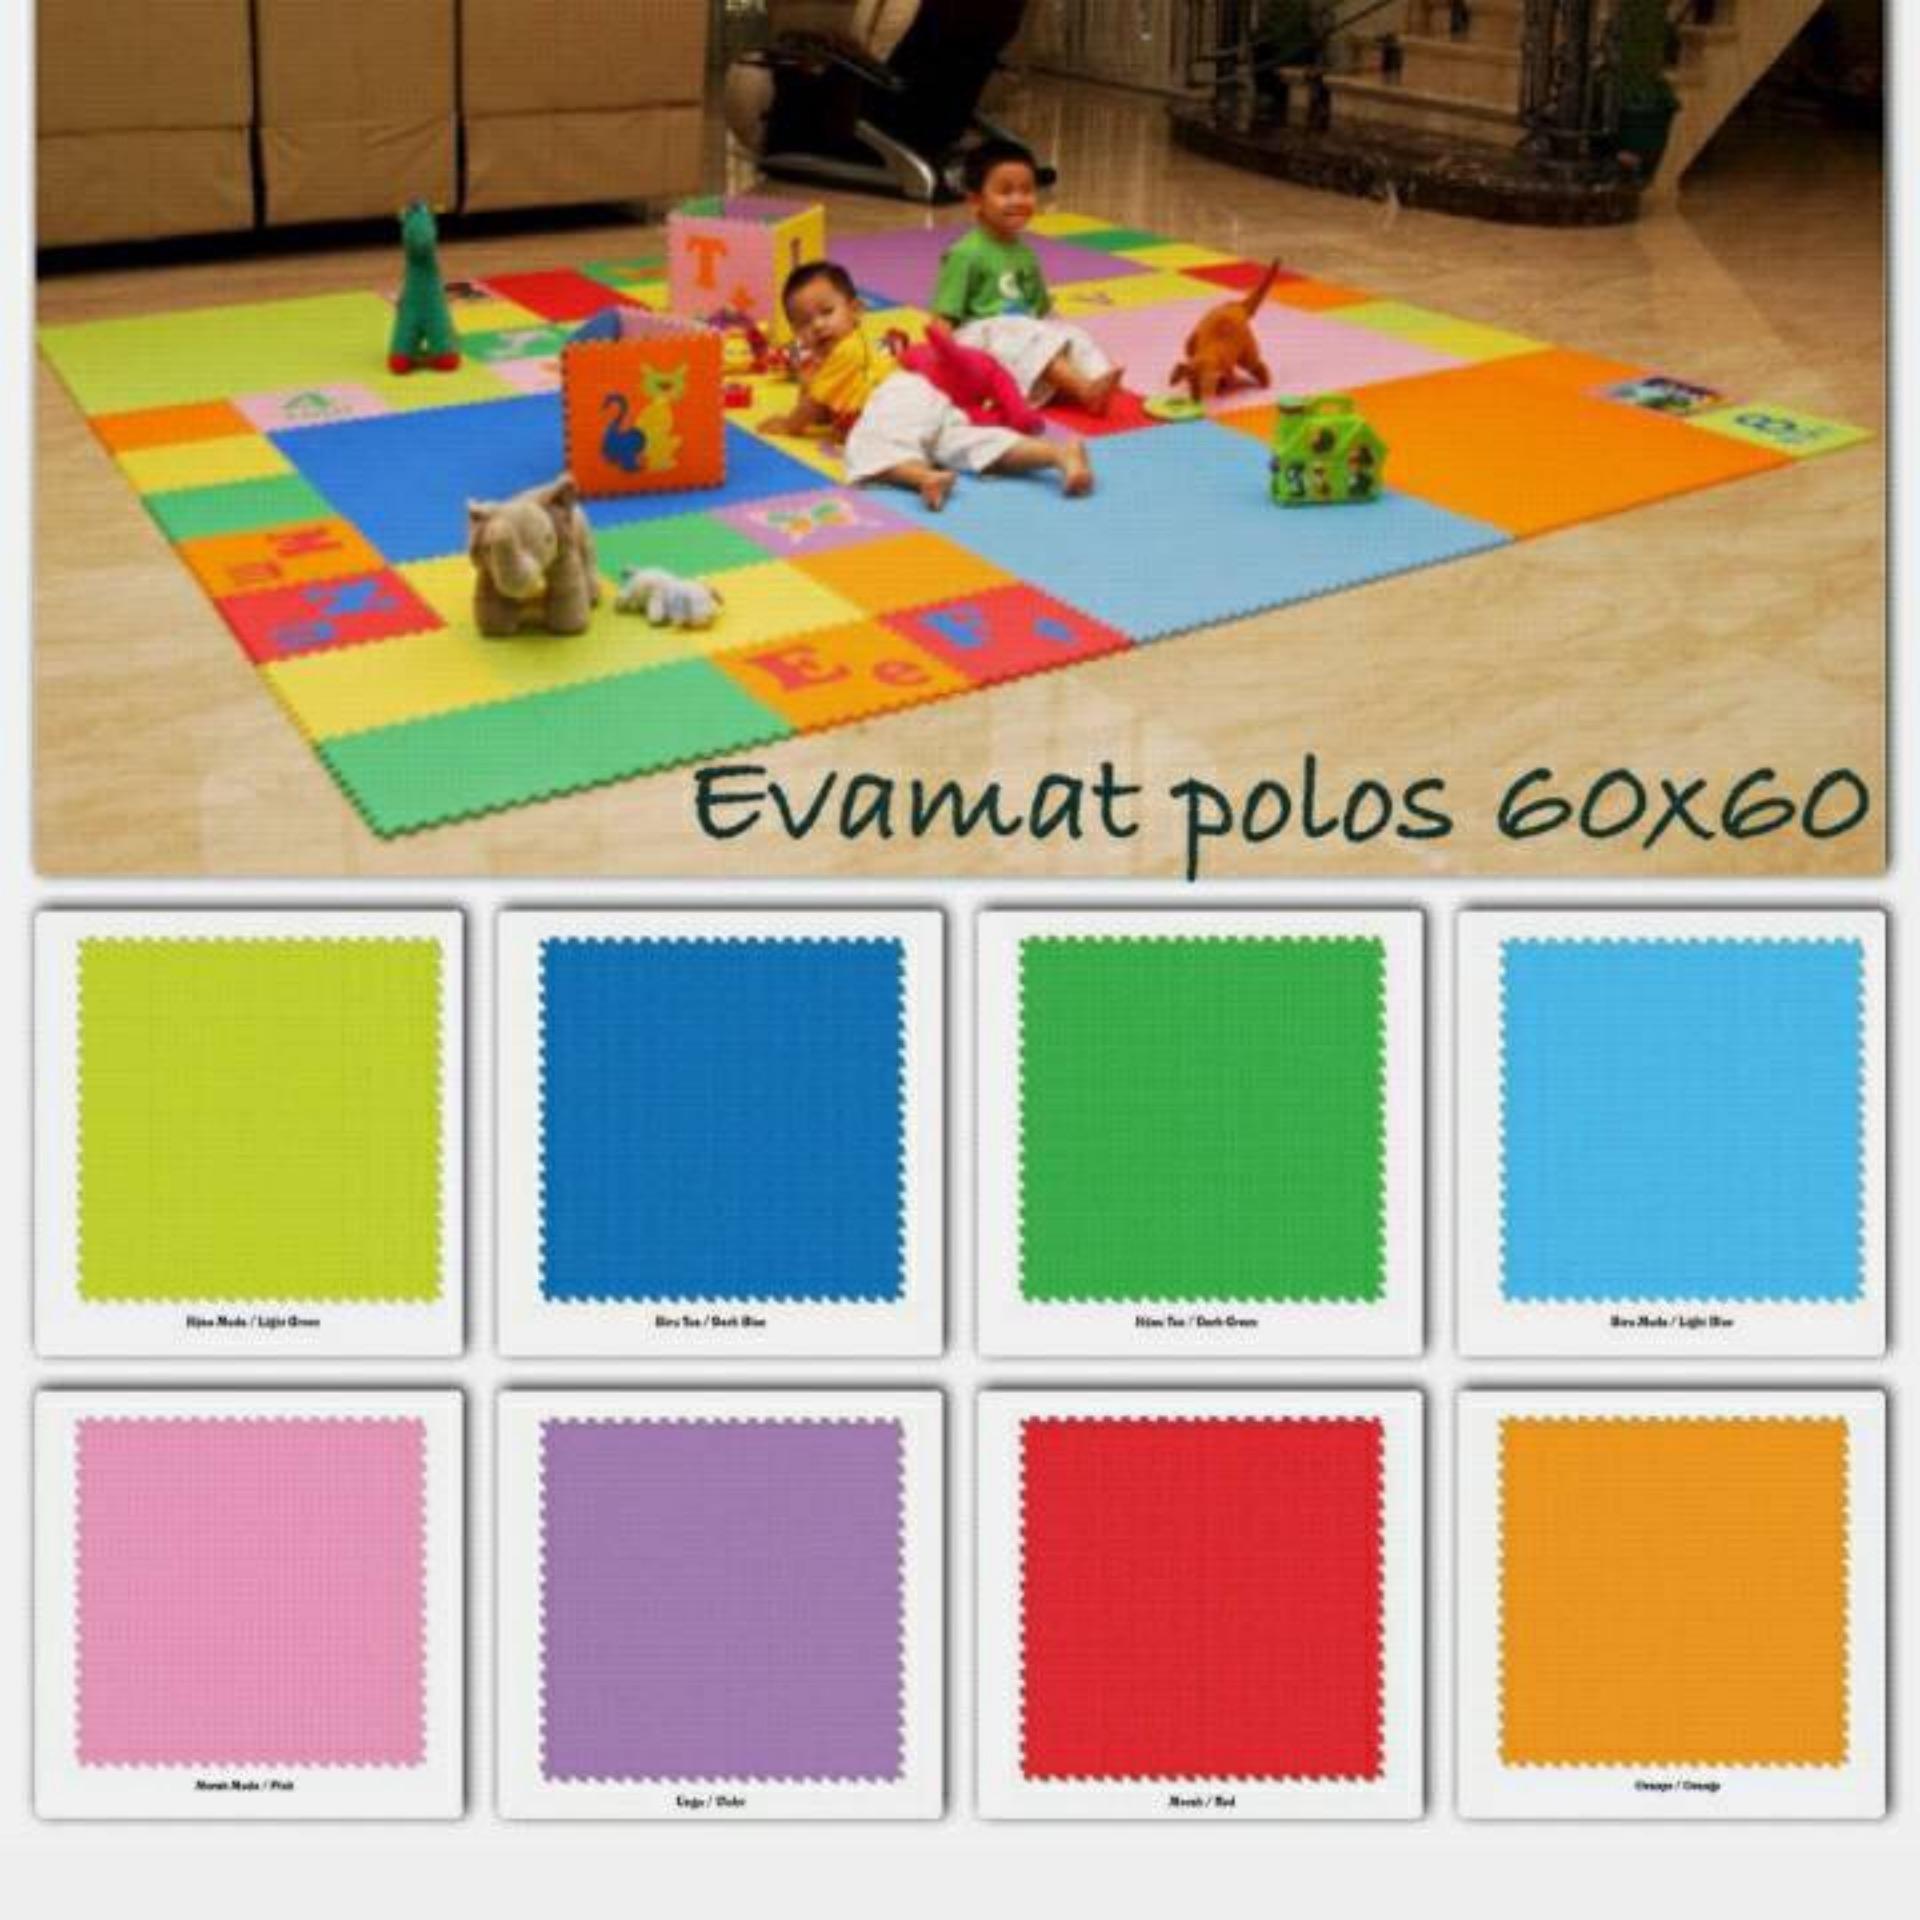 Evamats Polos / Matras /Tikar / Karpet / Puzzle Alas Lantai EvamatUkuran 60 x 60